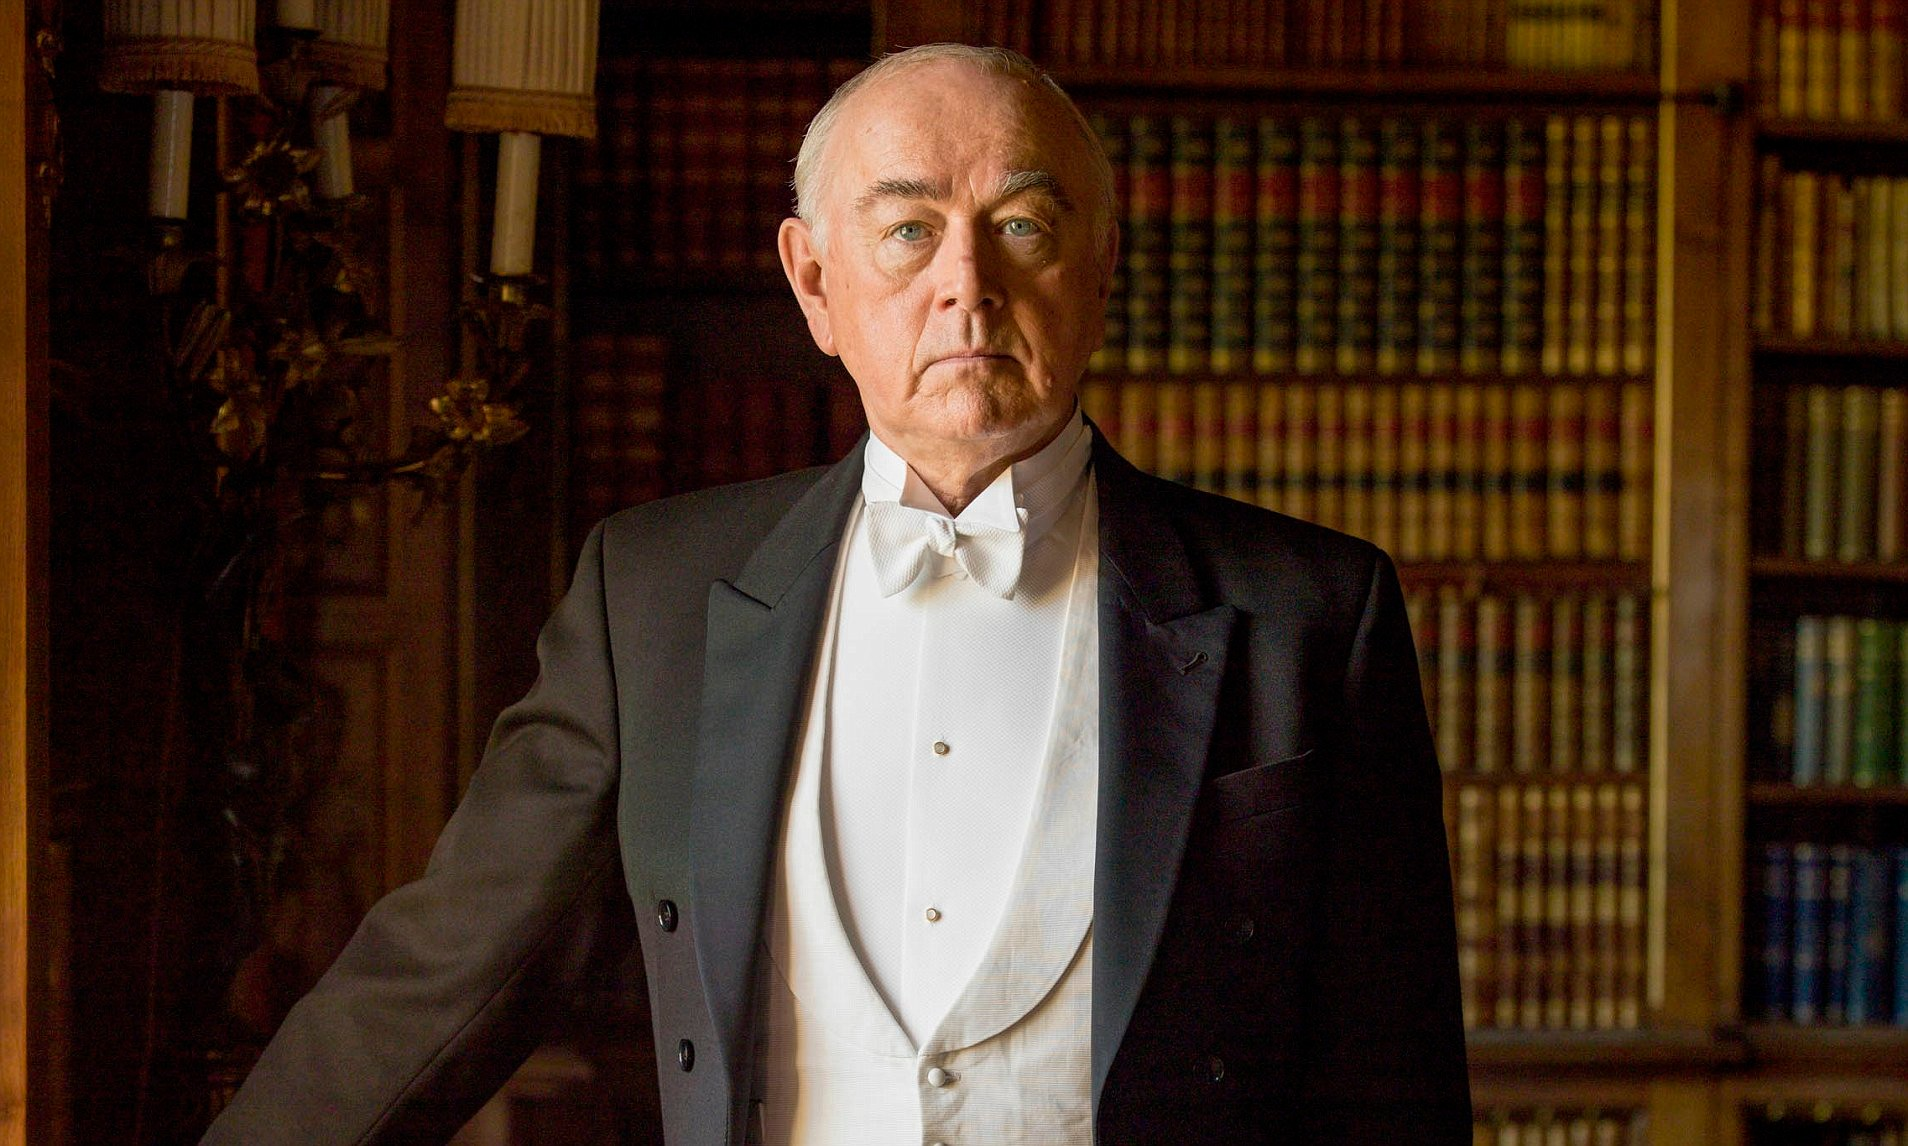 Peter Egan in Downton Abbey